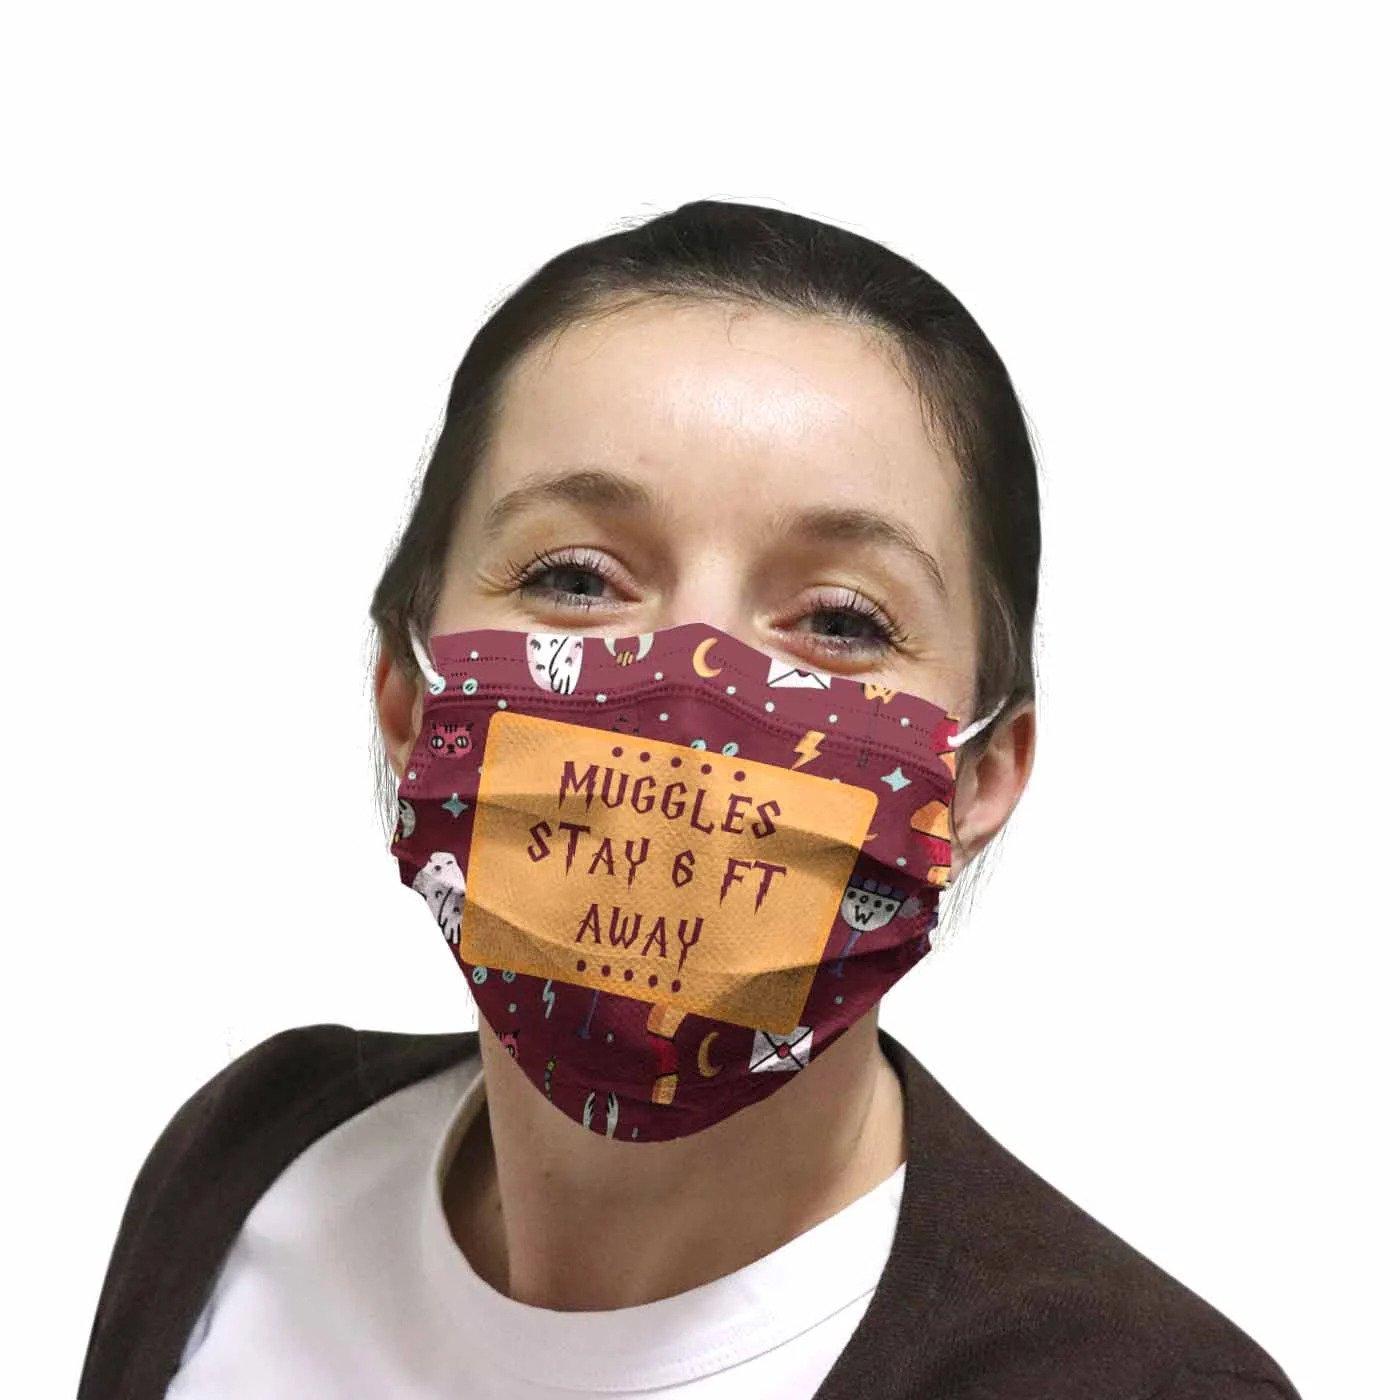 Harry Potter Muggle stay 6 feet away face mask